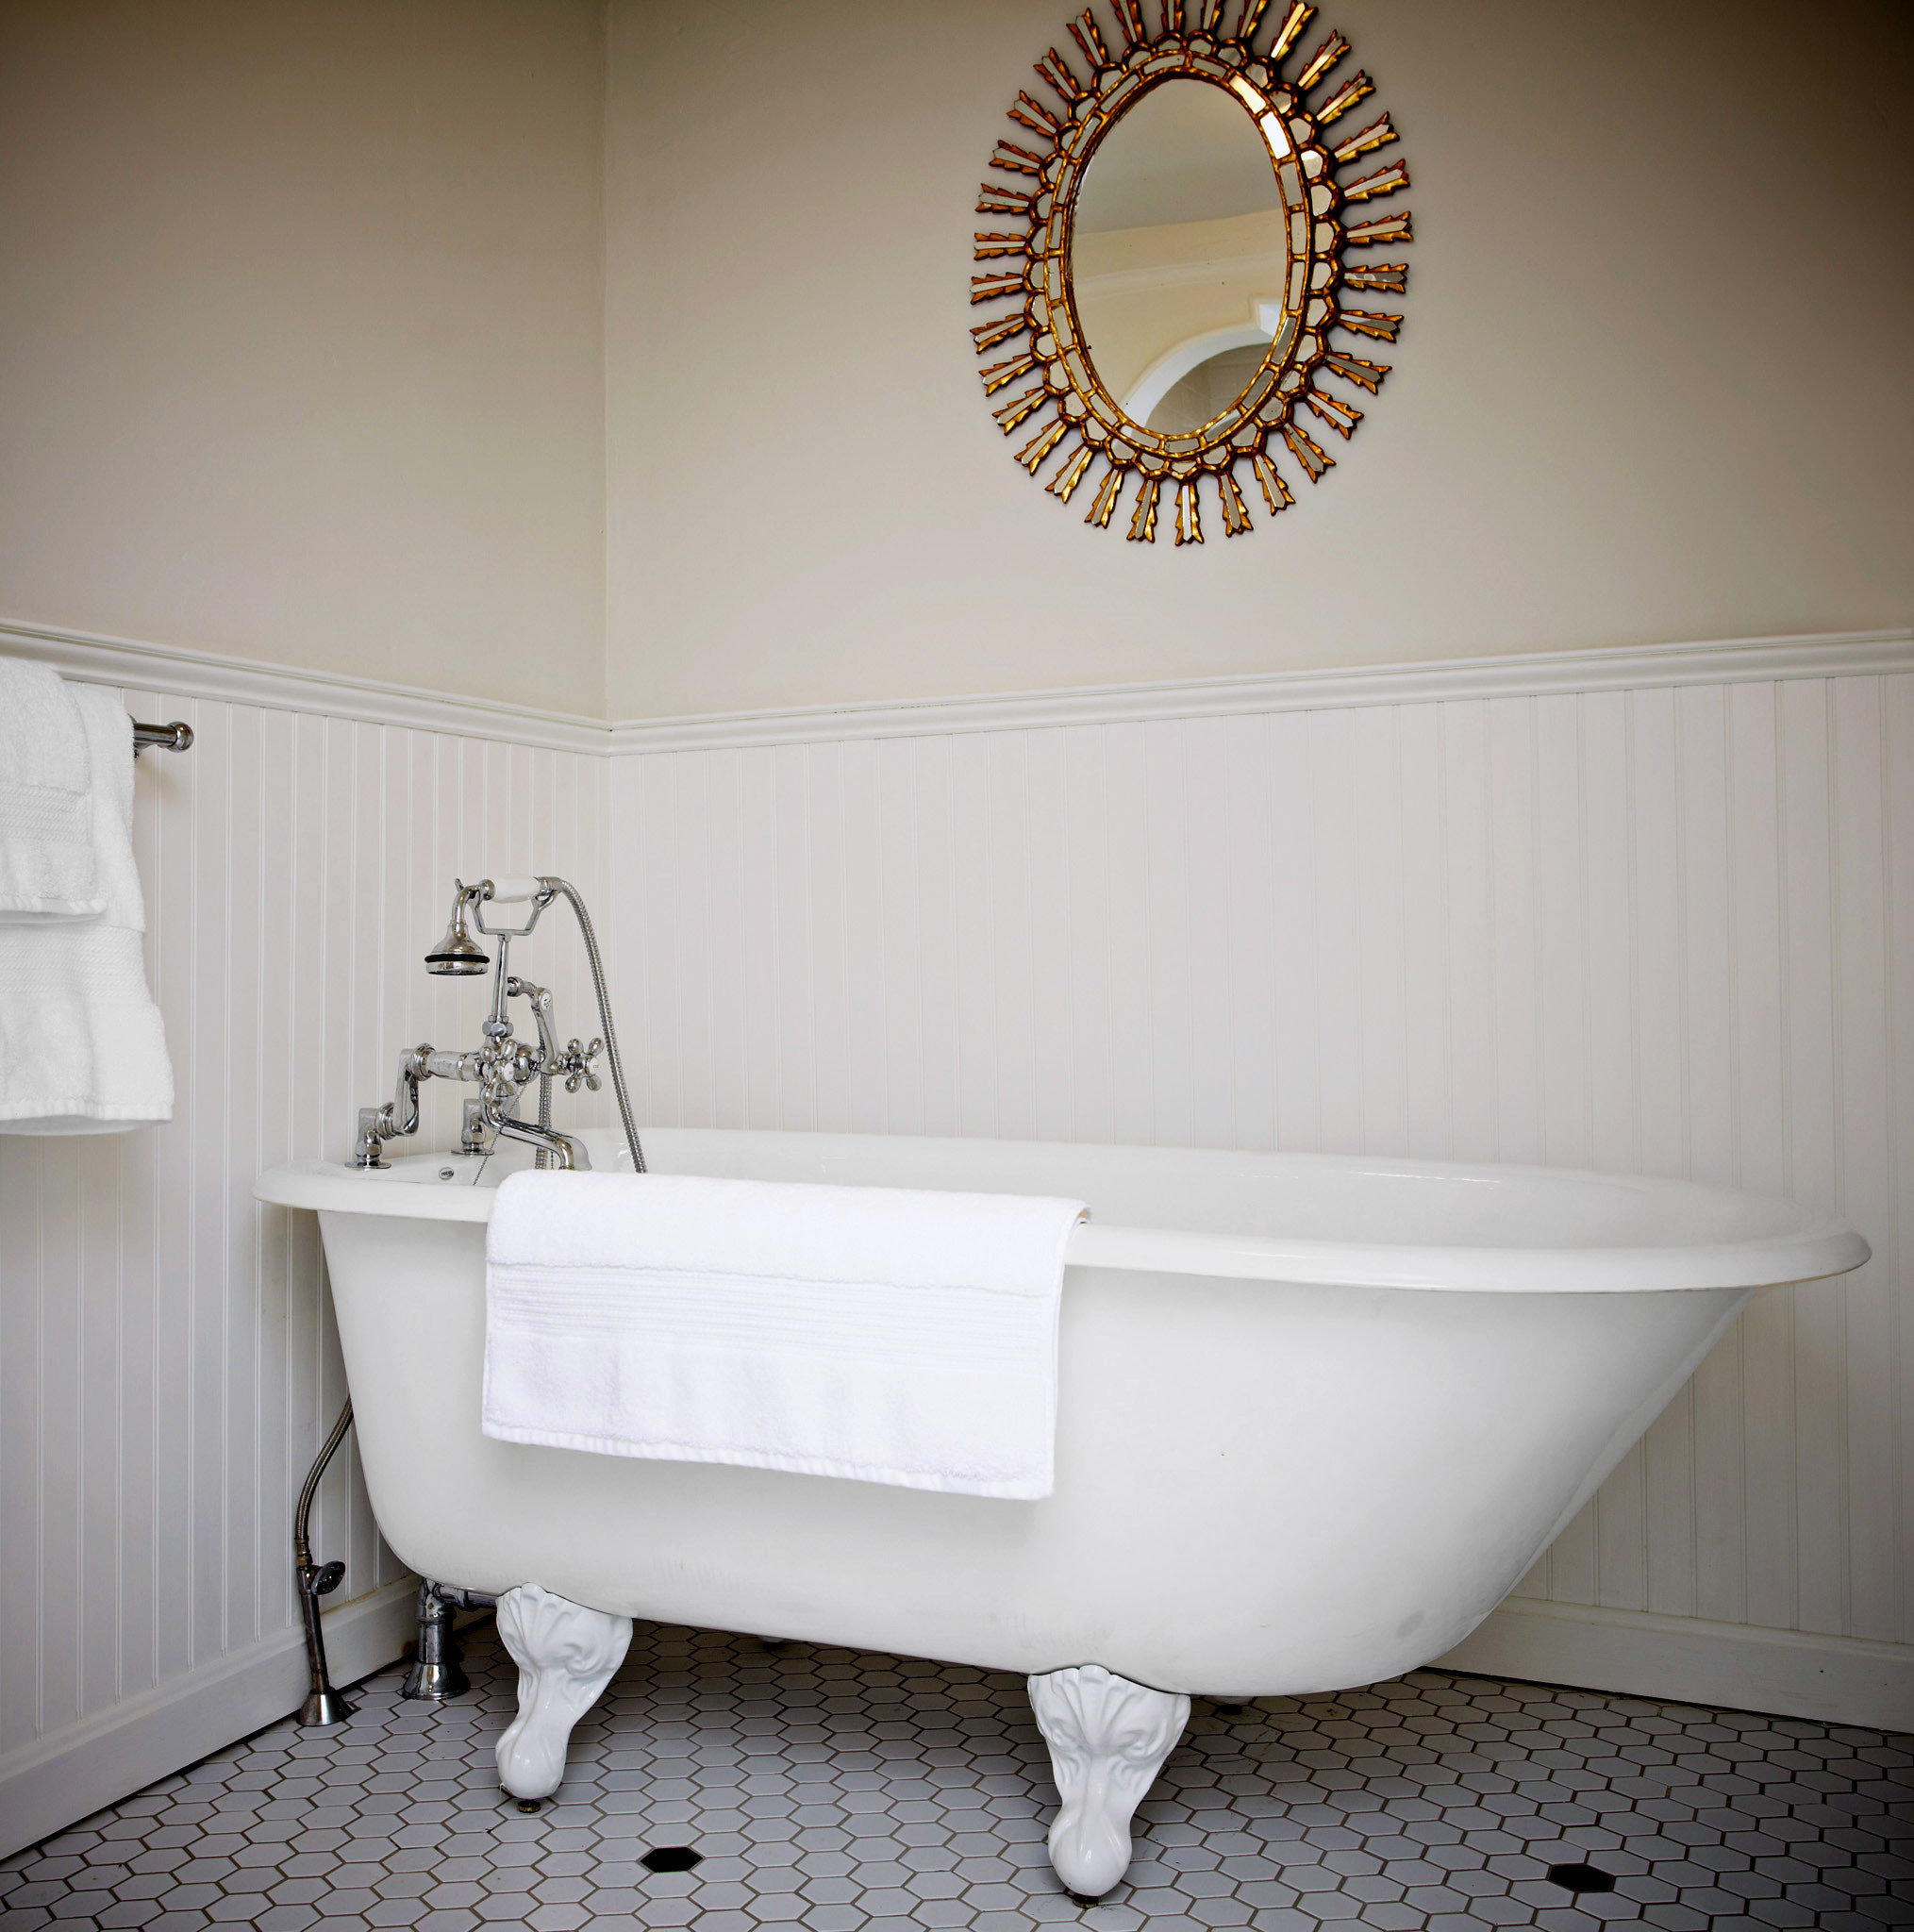 Bath Country Historic Inn white bathtub toilet bathroom plumbing fixture flooring sink bidet